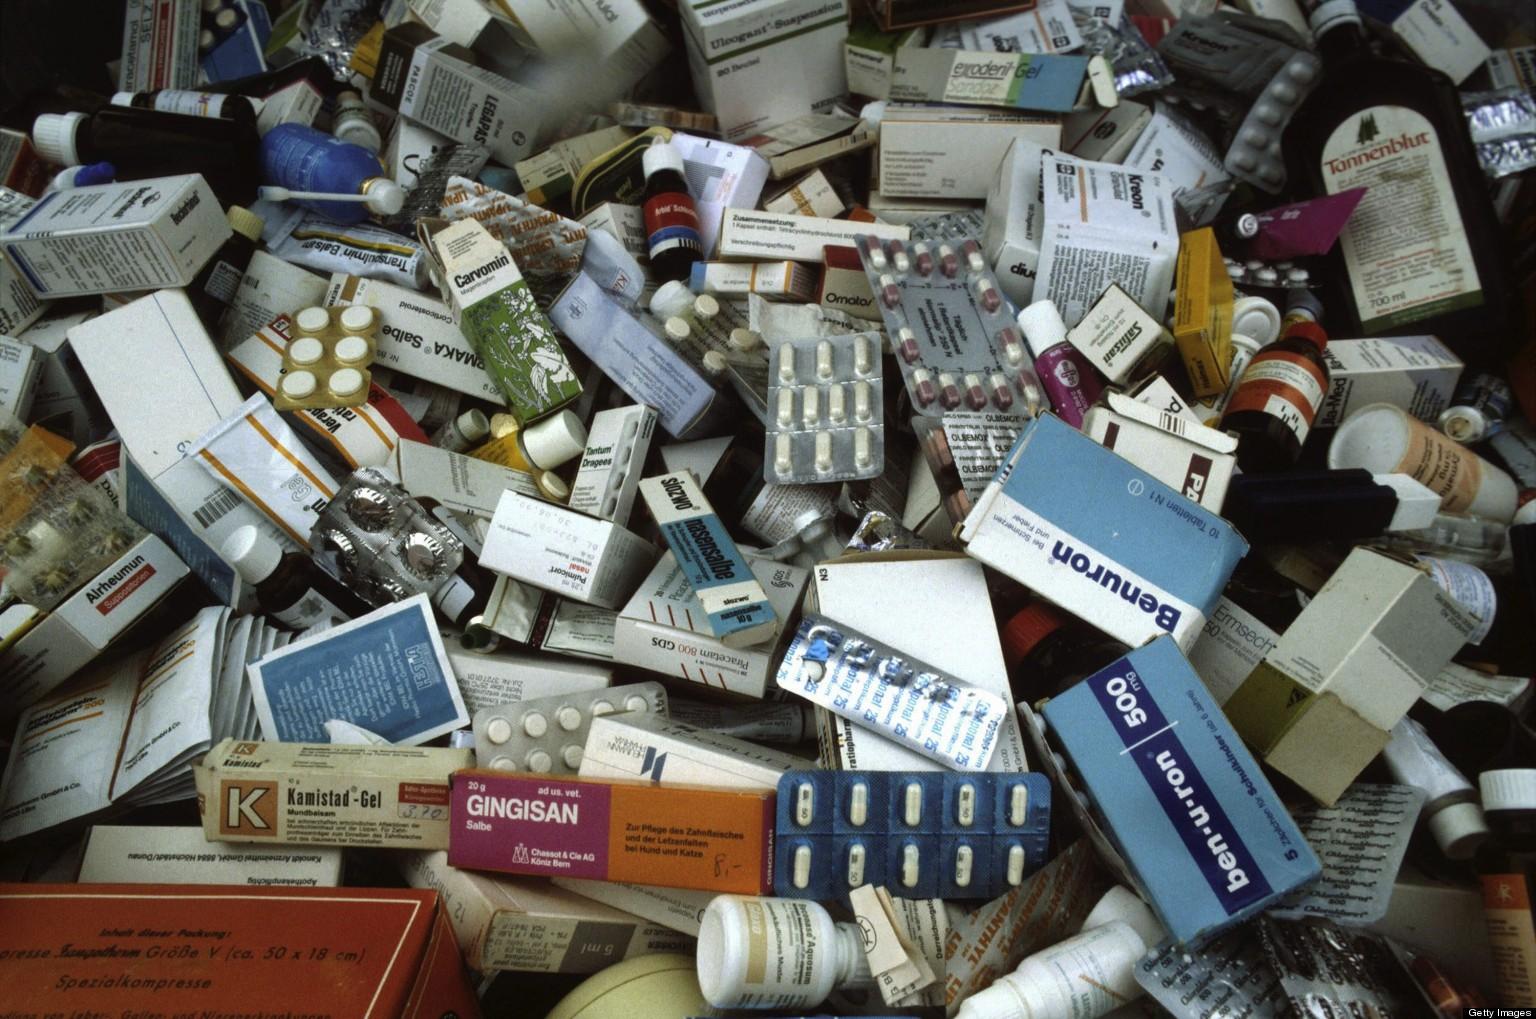 Dispose of the garbage debris junk litter trash - 1 8